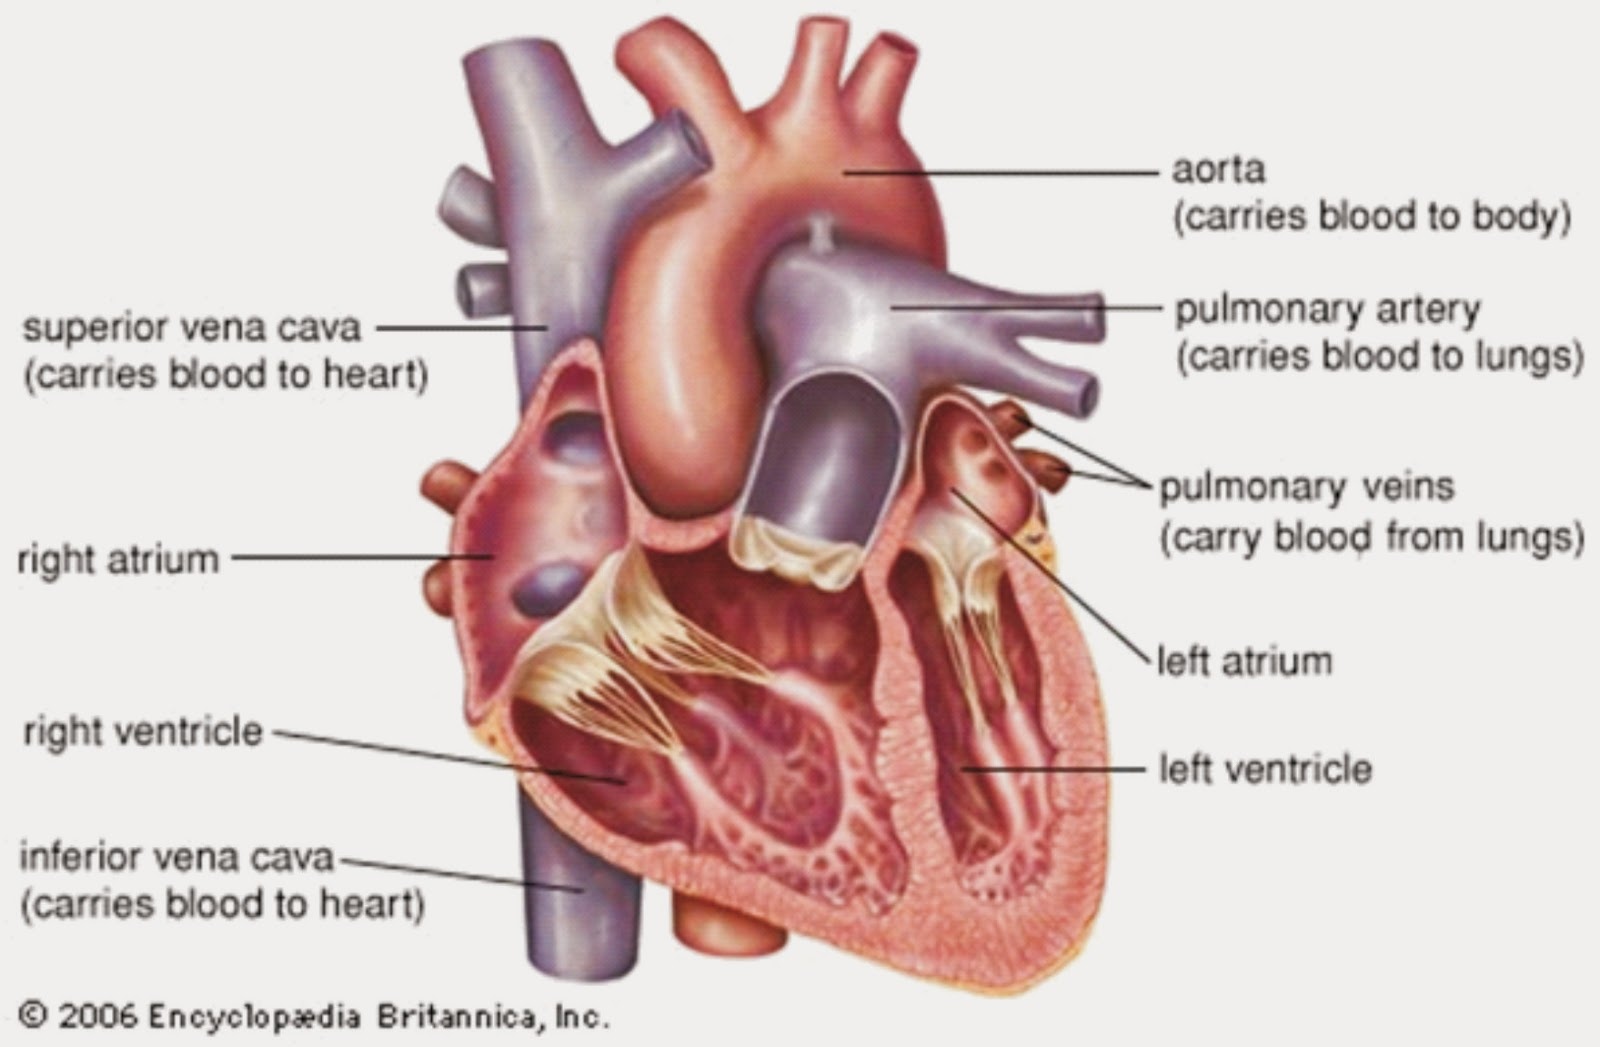 Heart anatomy test